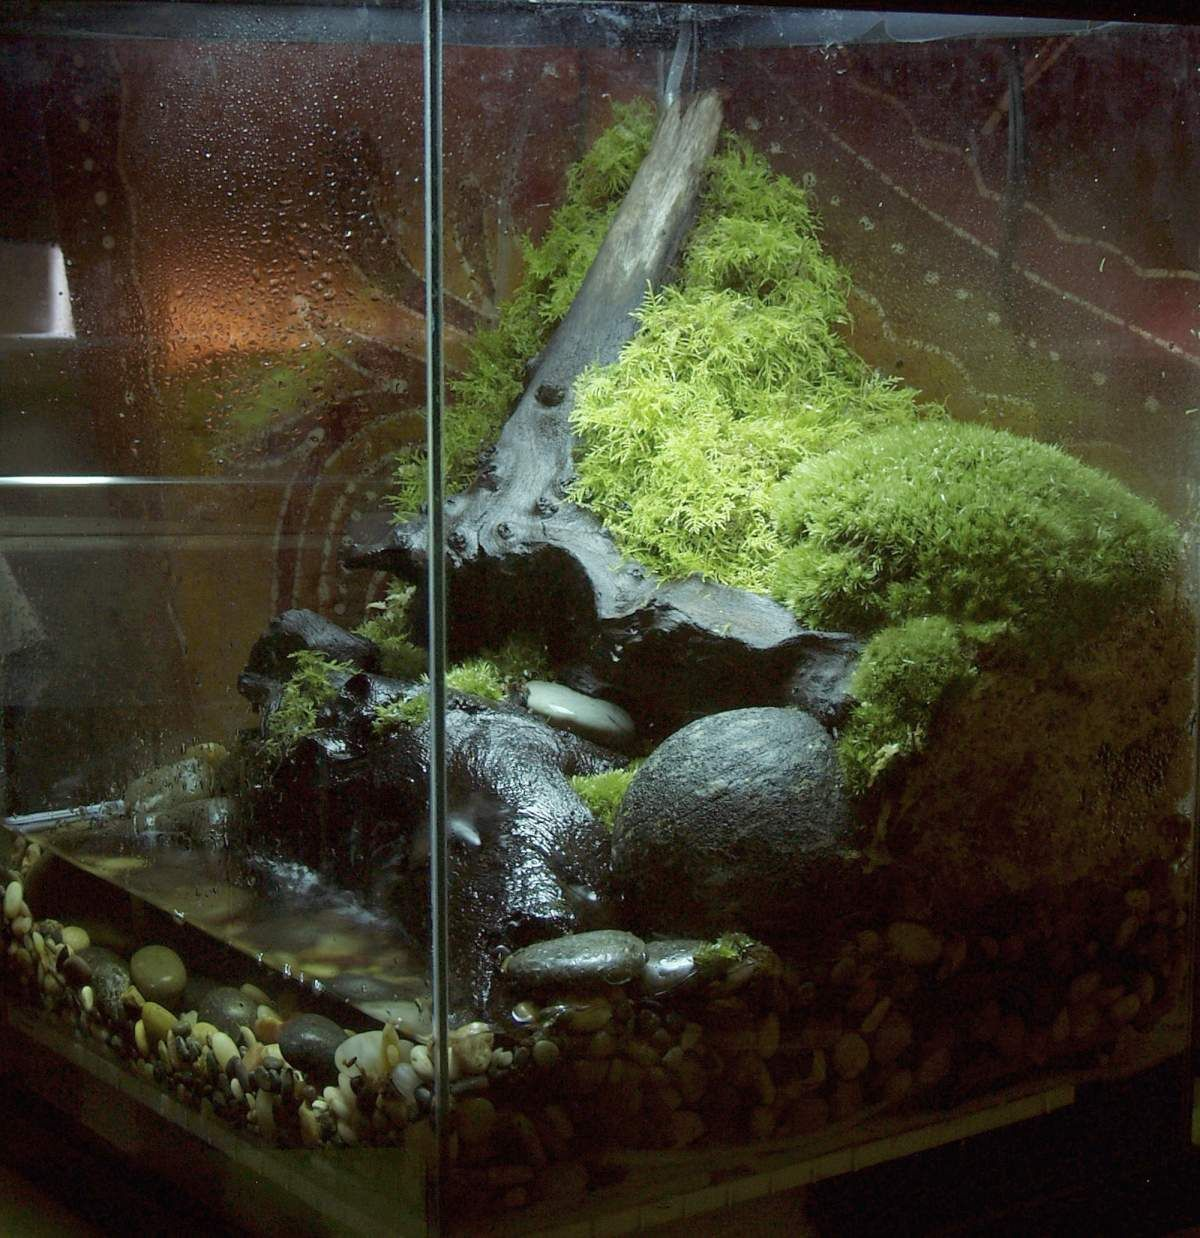 how to clean watermarks inside aquarium